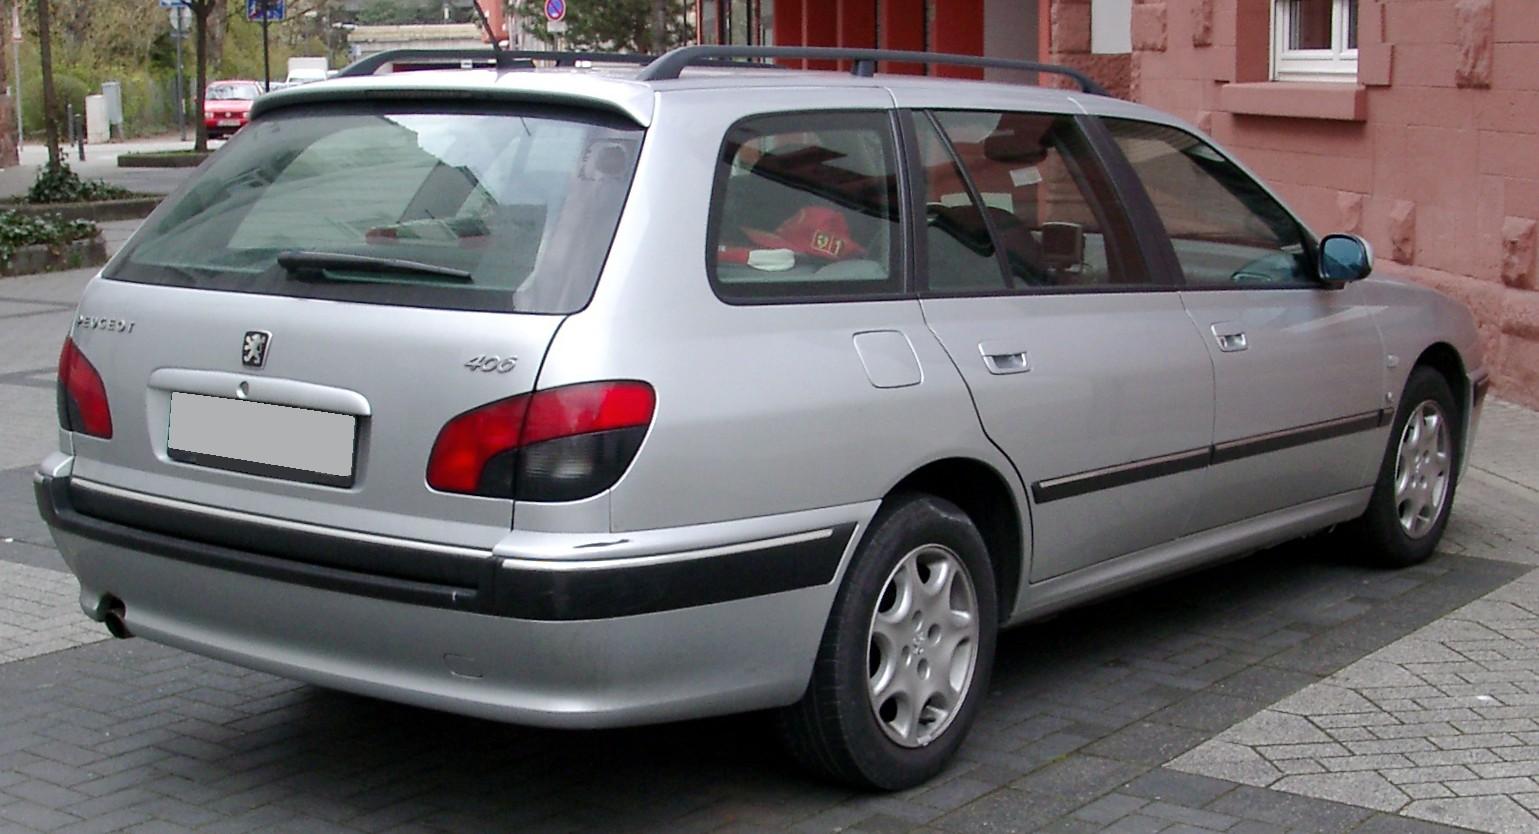 Peugeot 406 braucht hilfe!